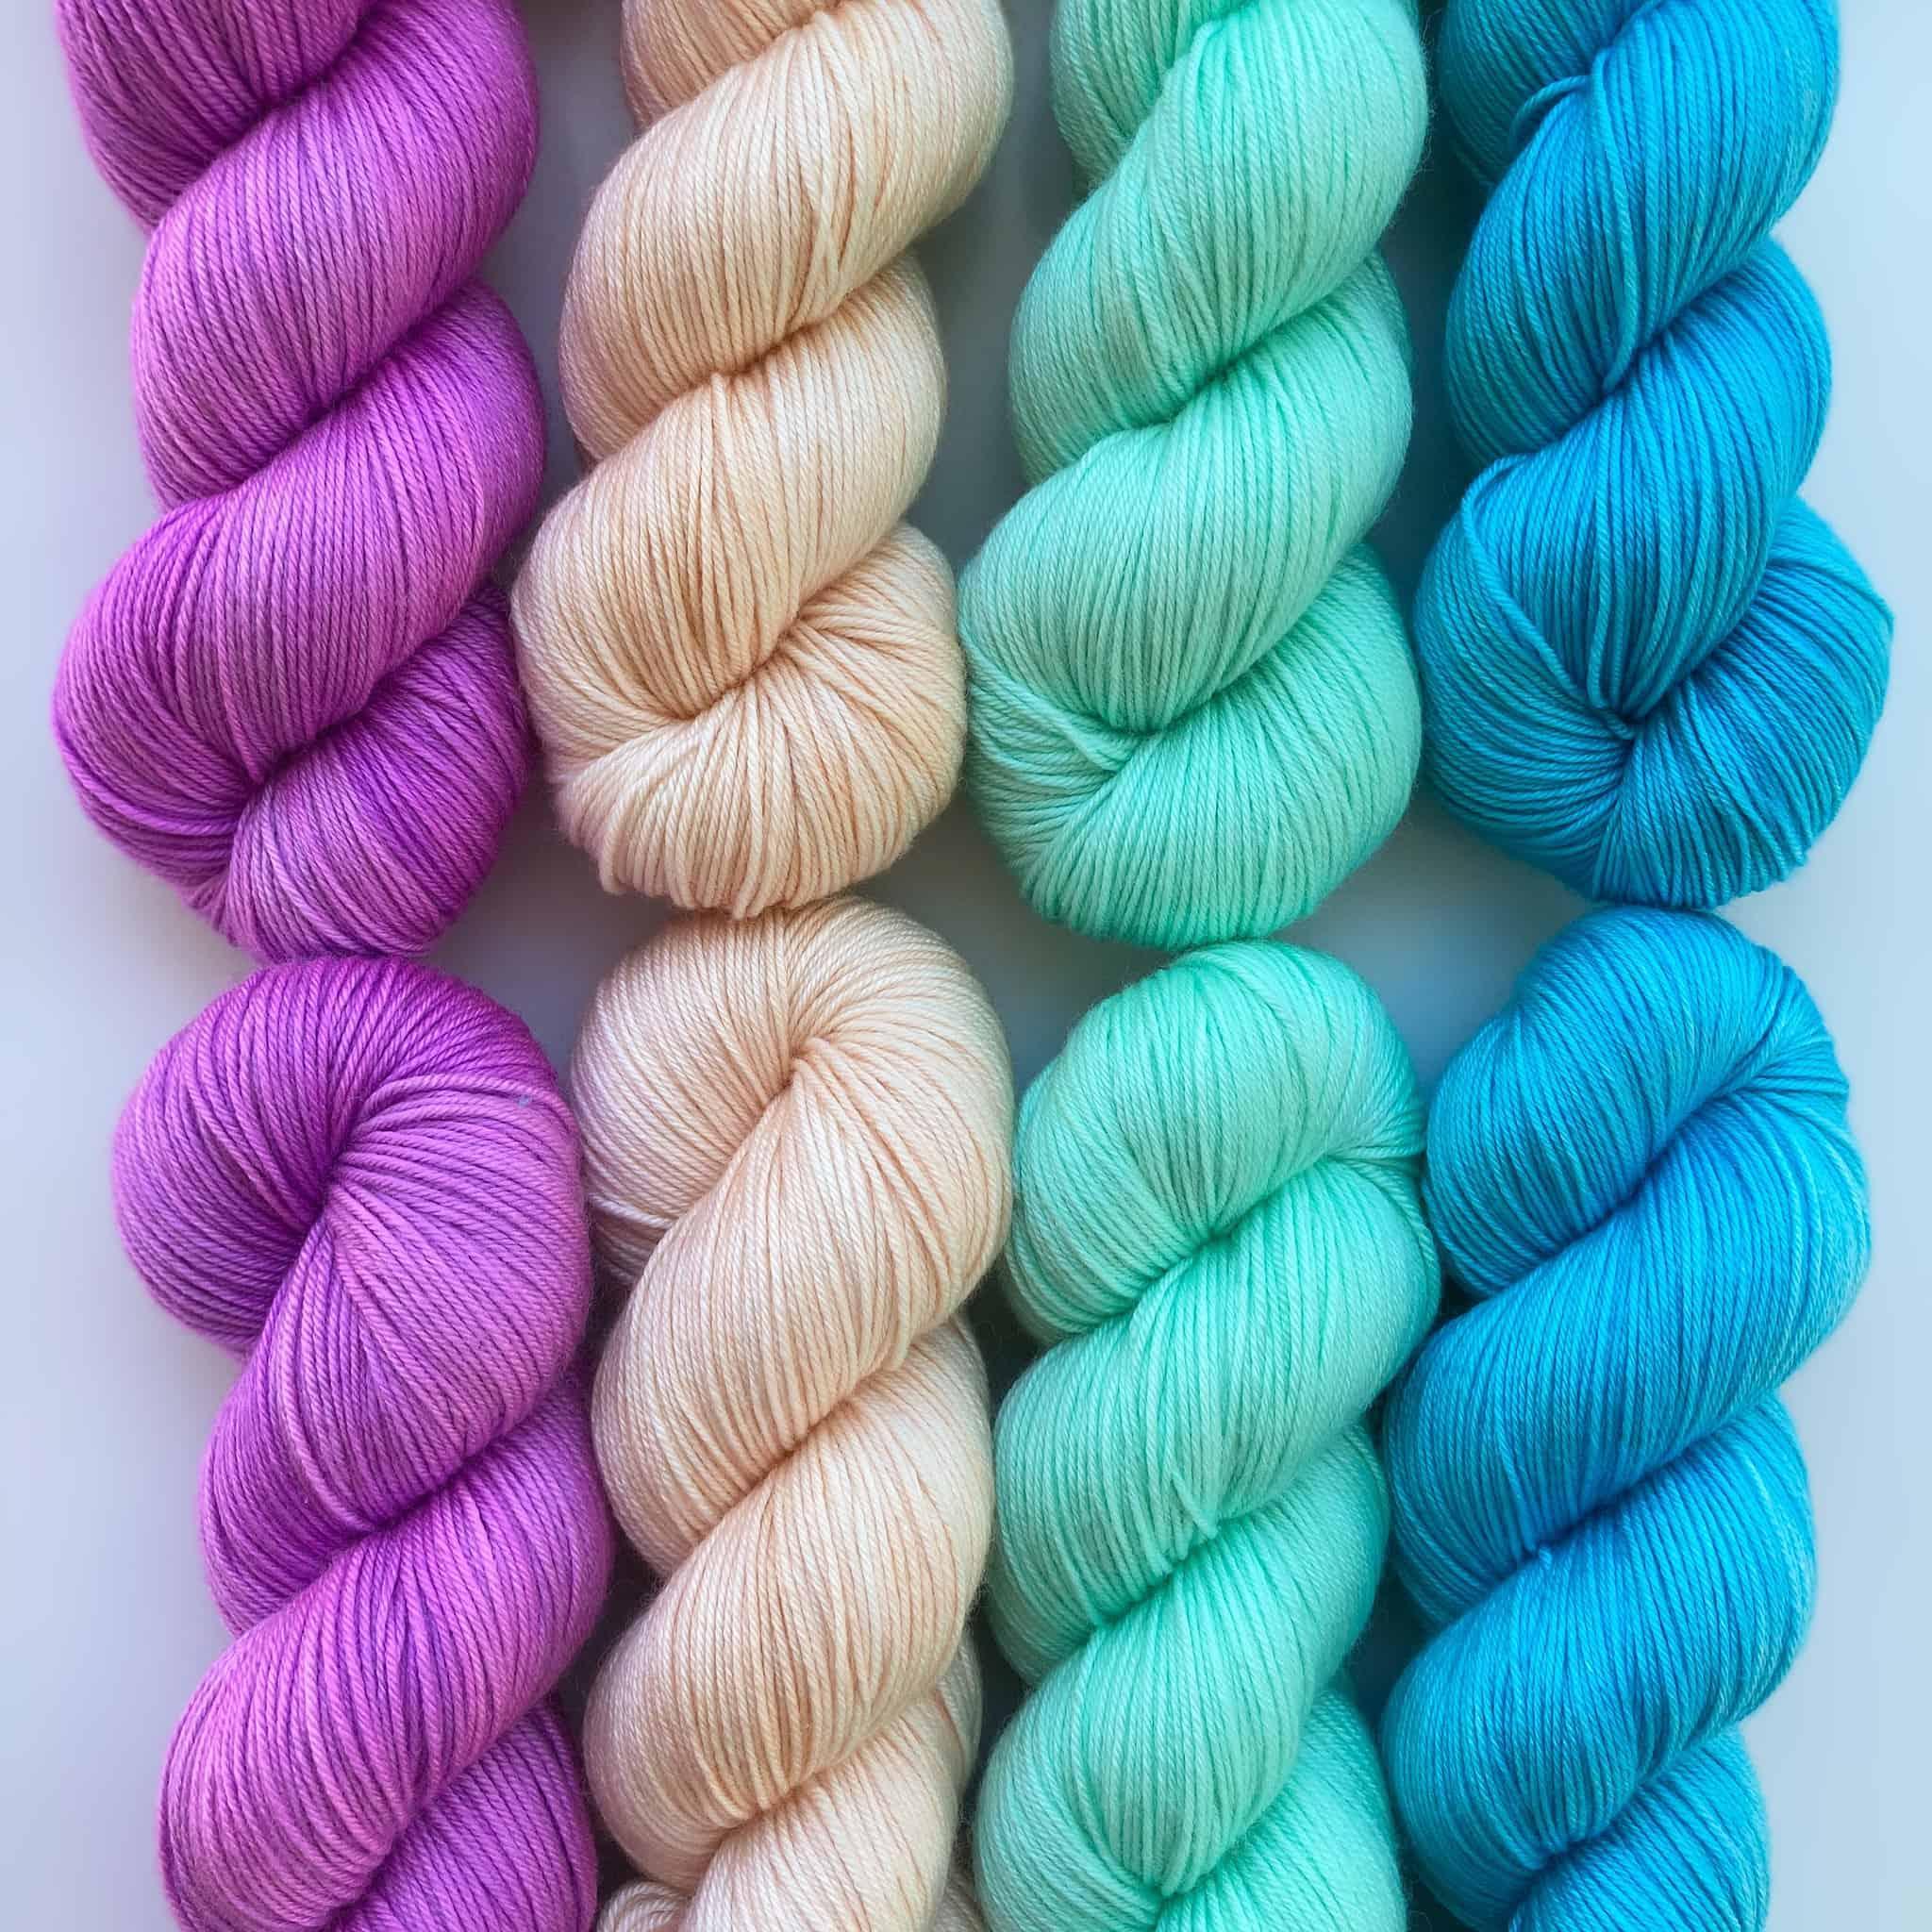 Purple, pink, aqua and blue yarn.